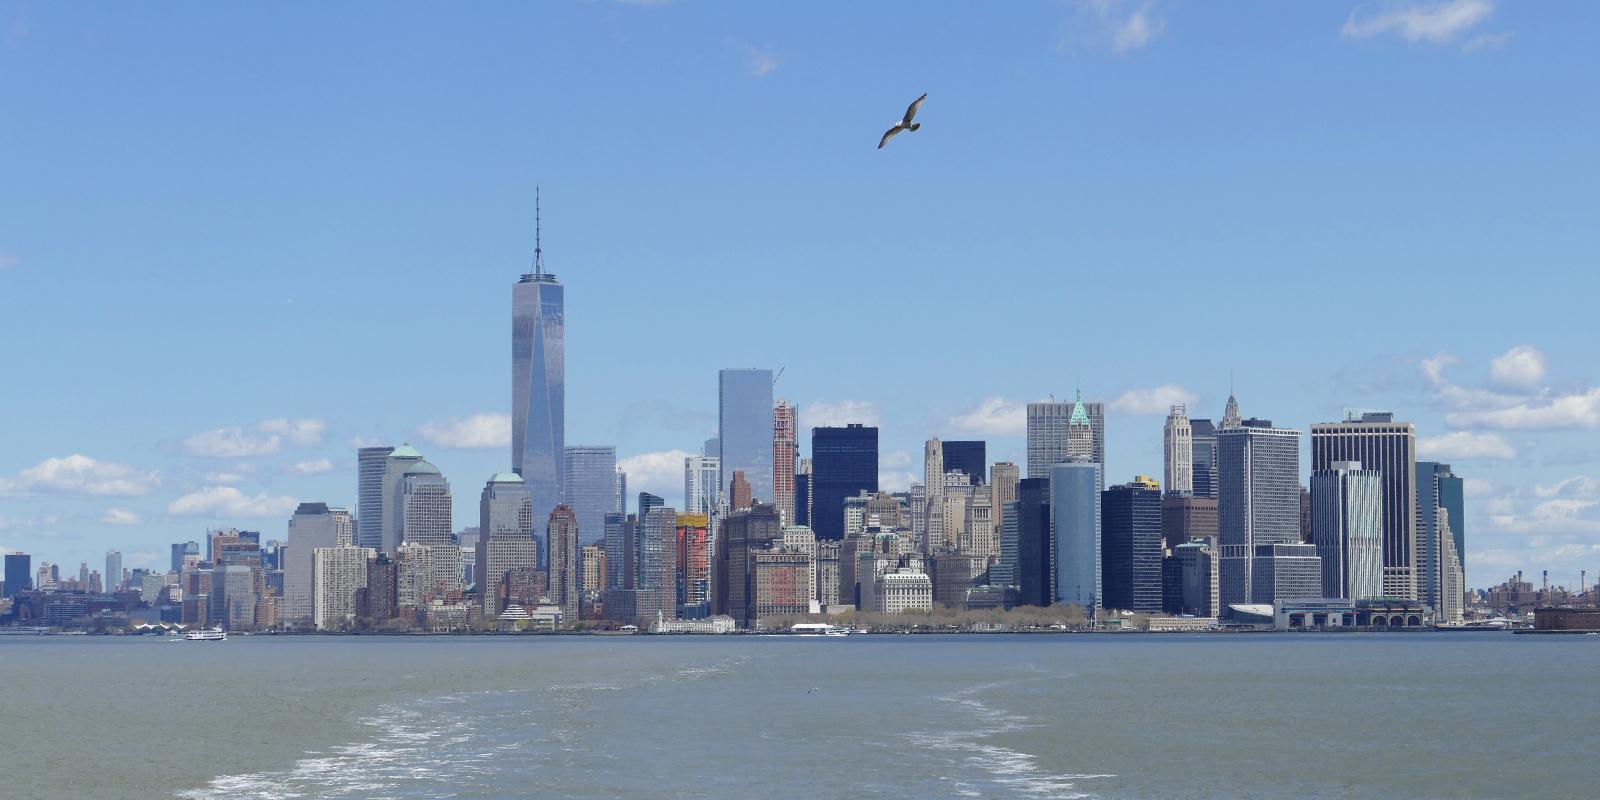 newyork_manatthan001